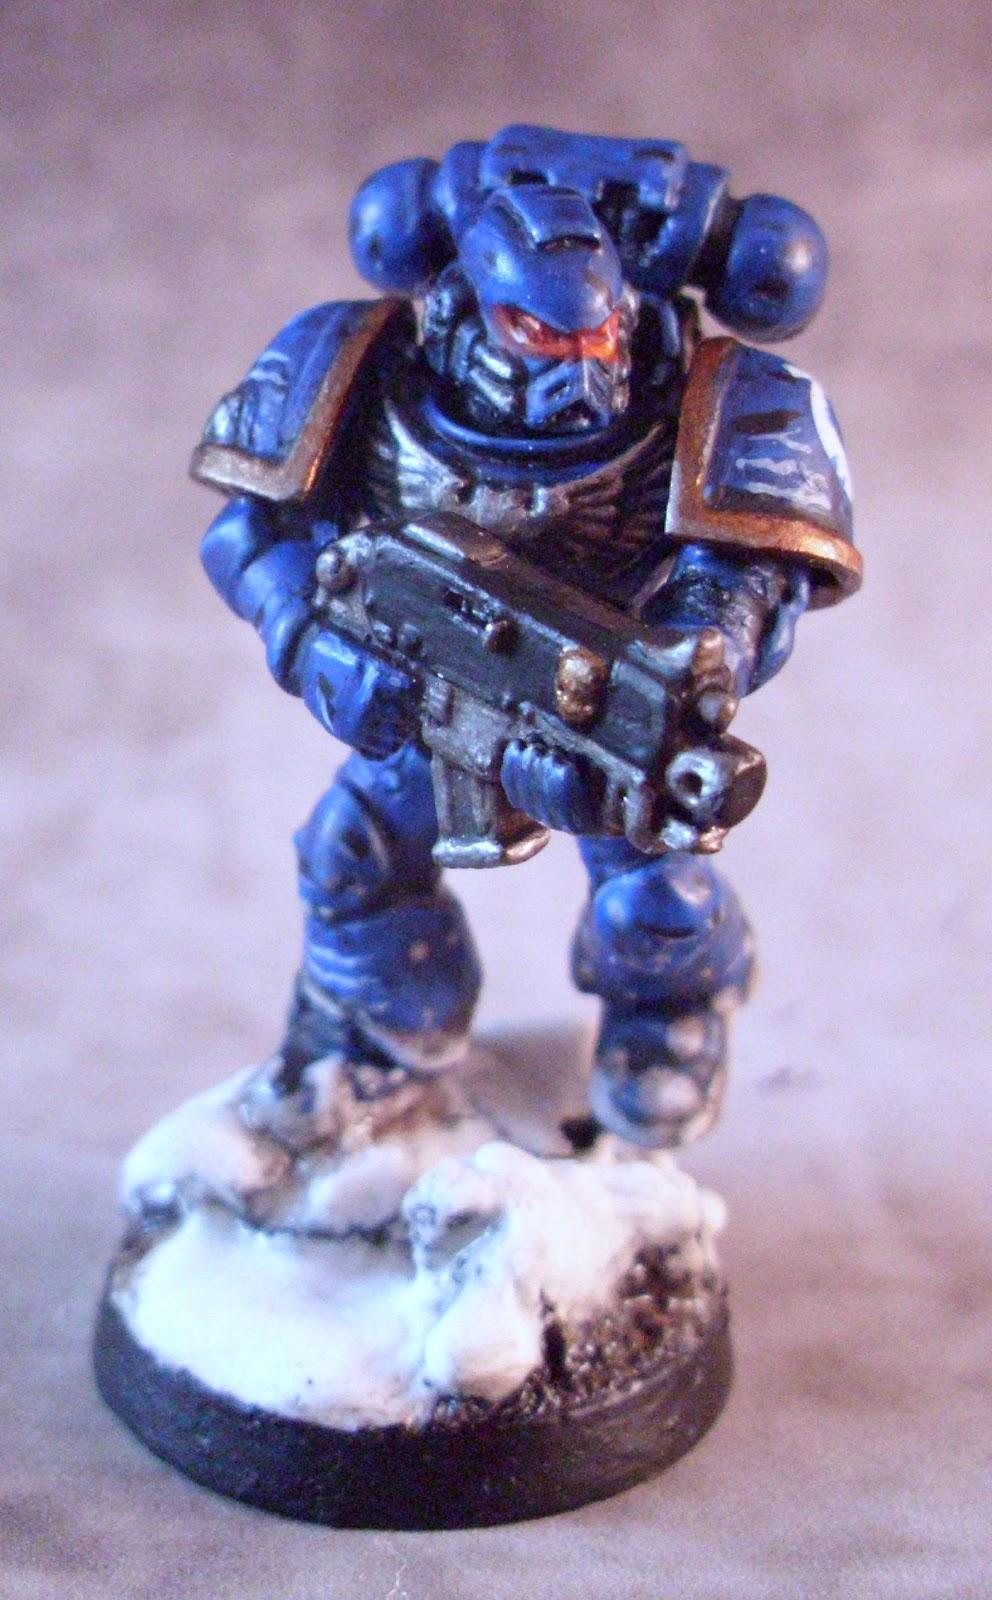 Malevolent Miniatures Hidden Surprise and Commission Update